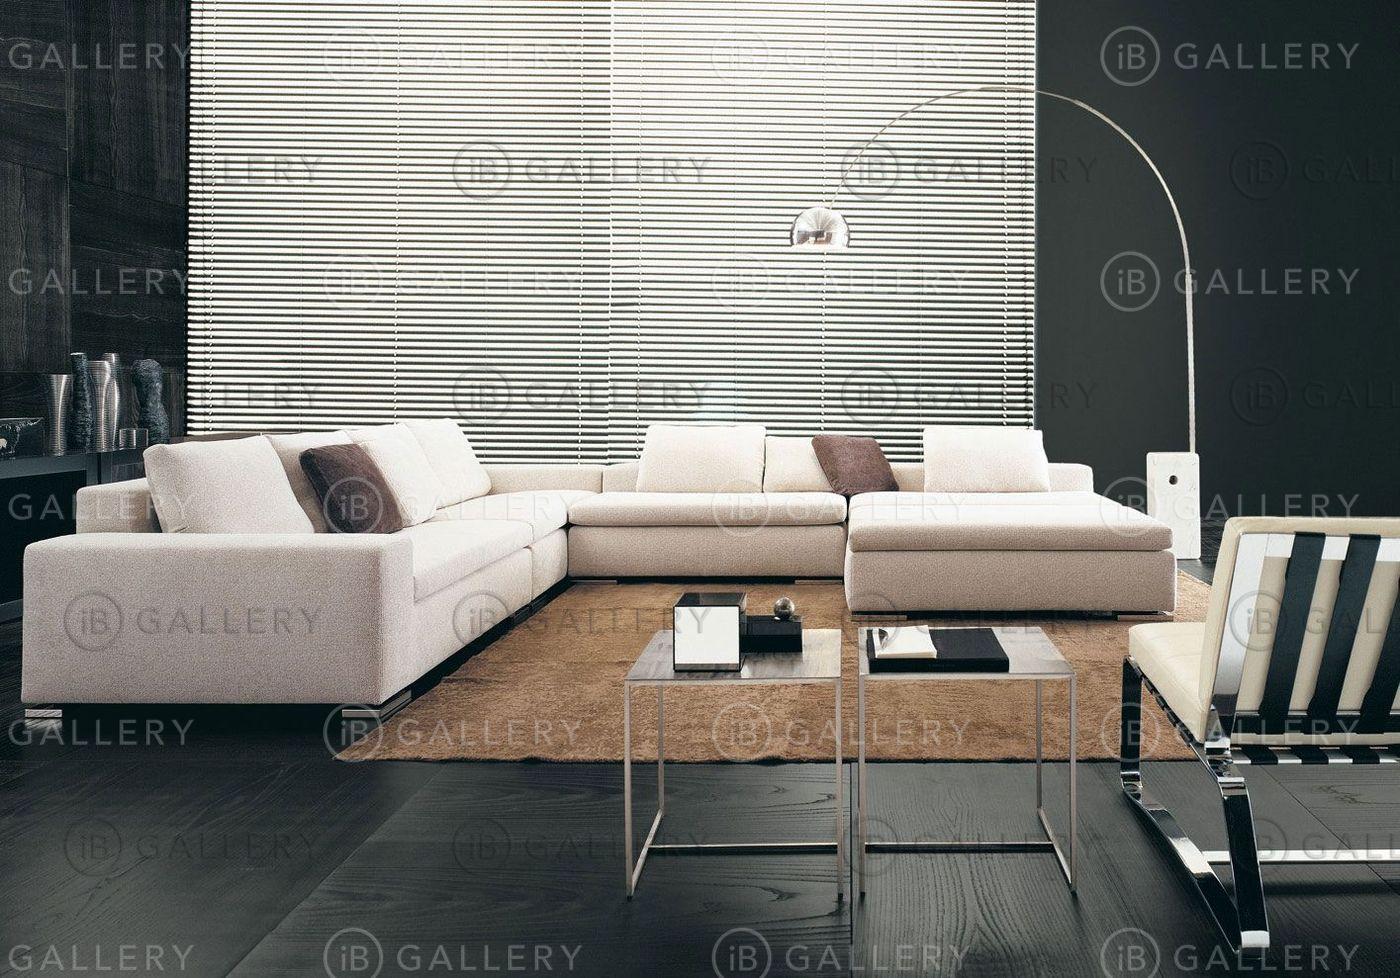 z gallerie stella sofa cleaning designs pictures 2017 Модульный диван minotti moore из Италии ib gallery